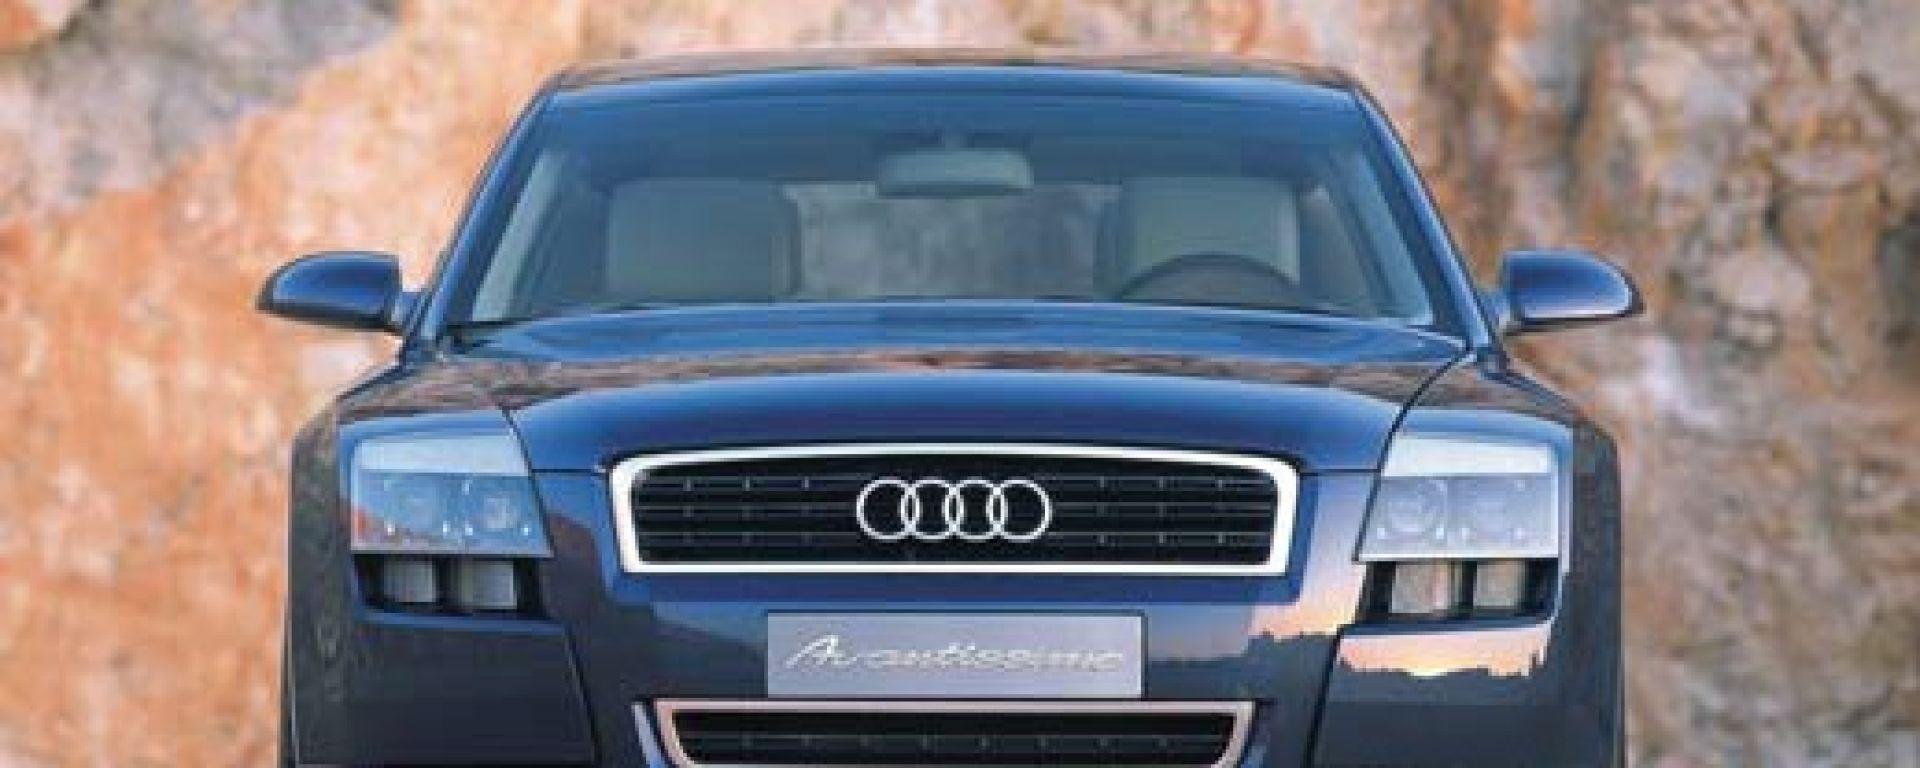 Audi guarda Avantissimo